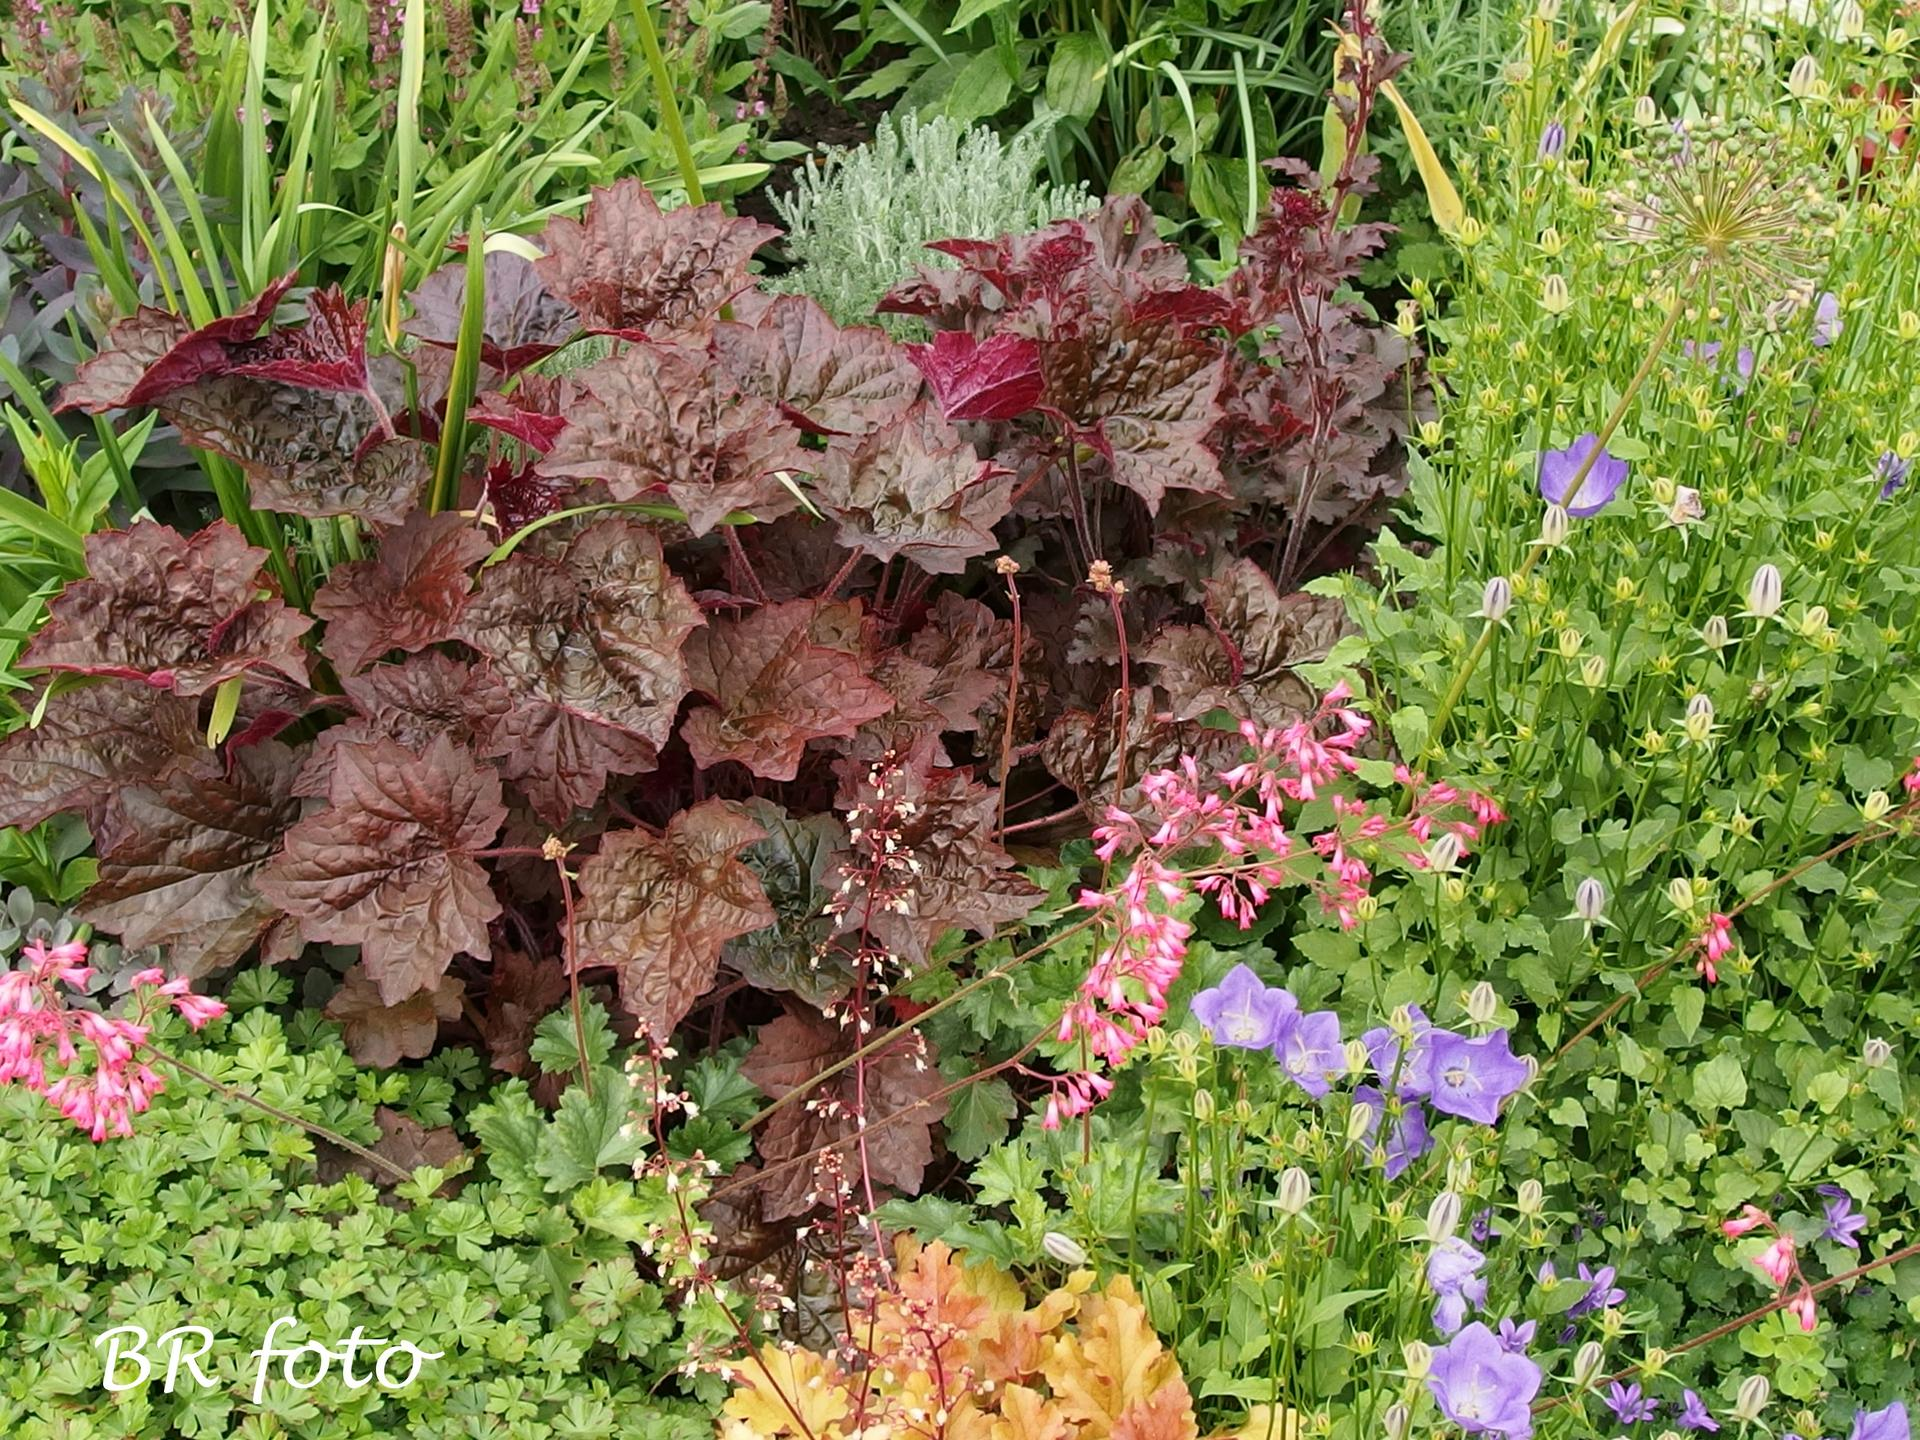 Zahrada v červnu - vše roste a kvete jako o život.... - dlužicha